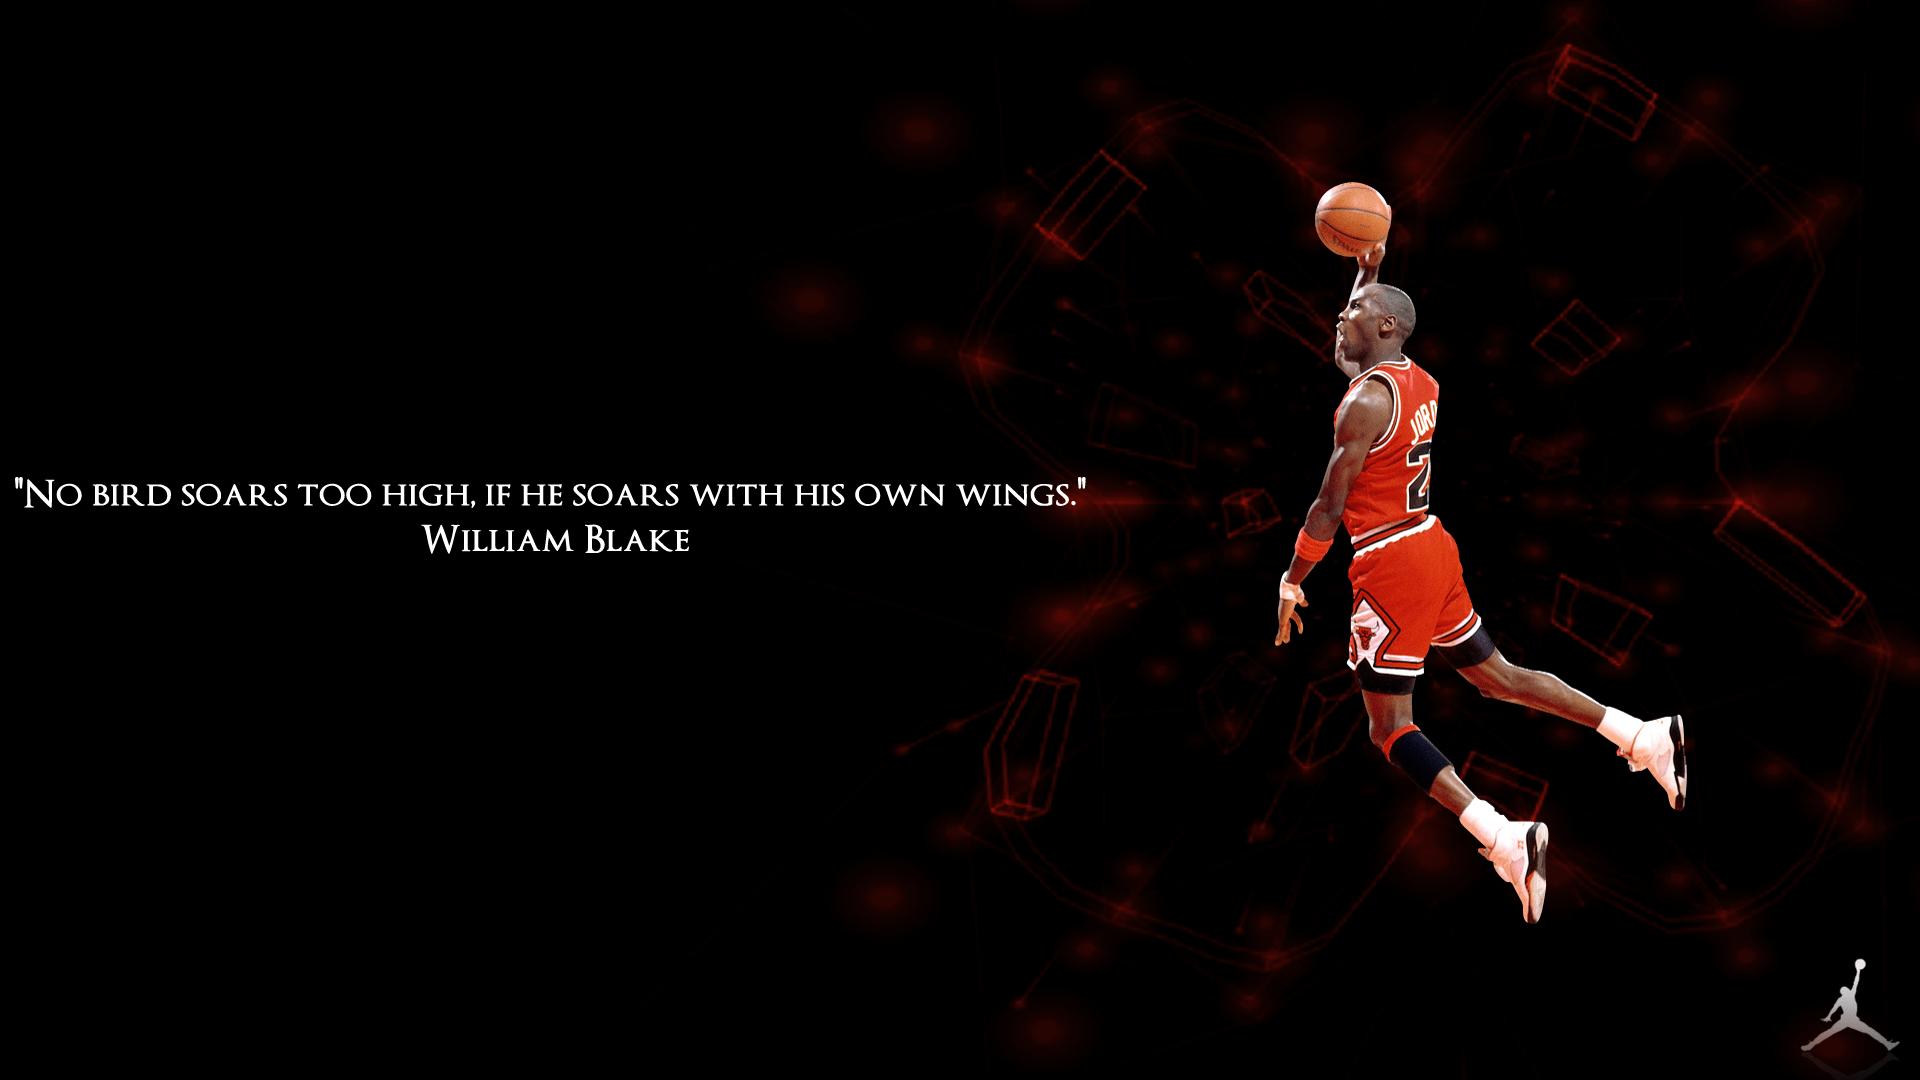 Michael Jordan Wallpaper Hd Michael Jordan Wallpapers Hd Download Free Pixelstalk Net